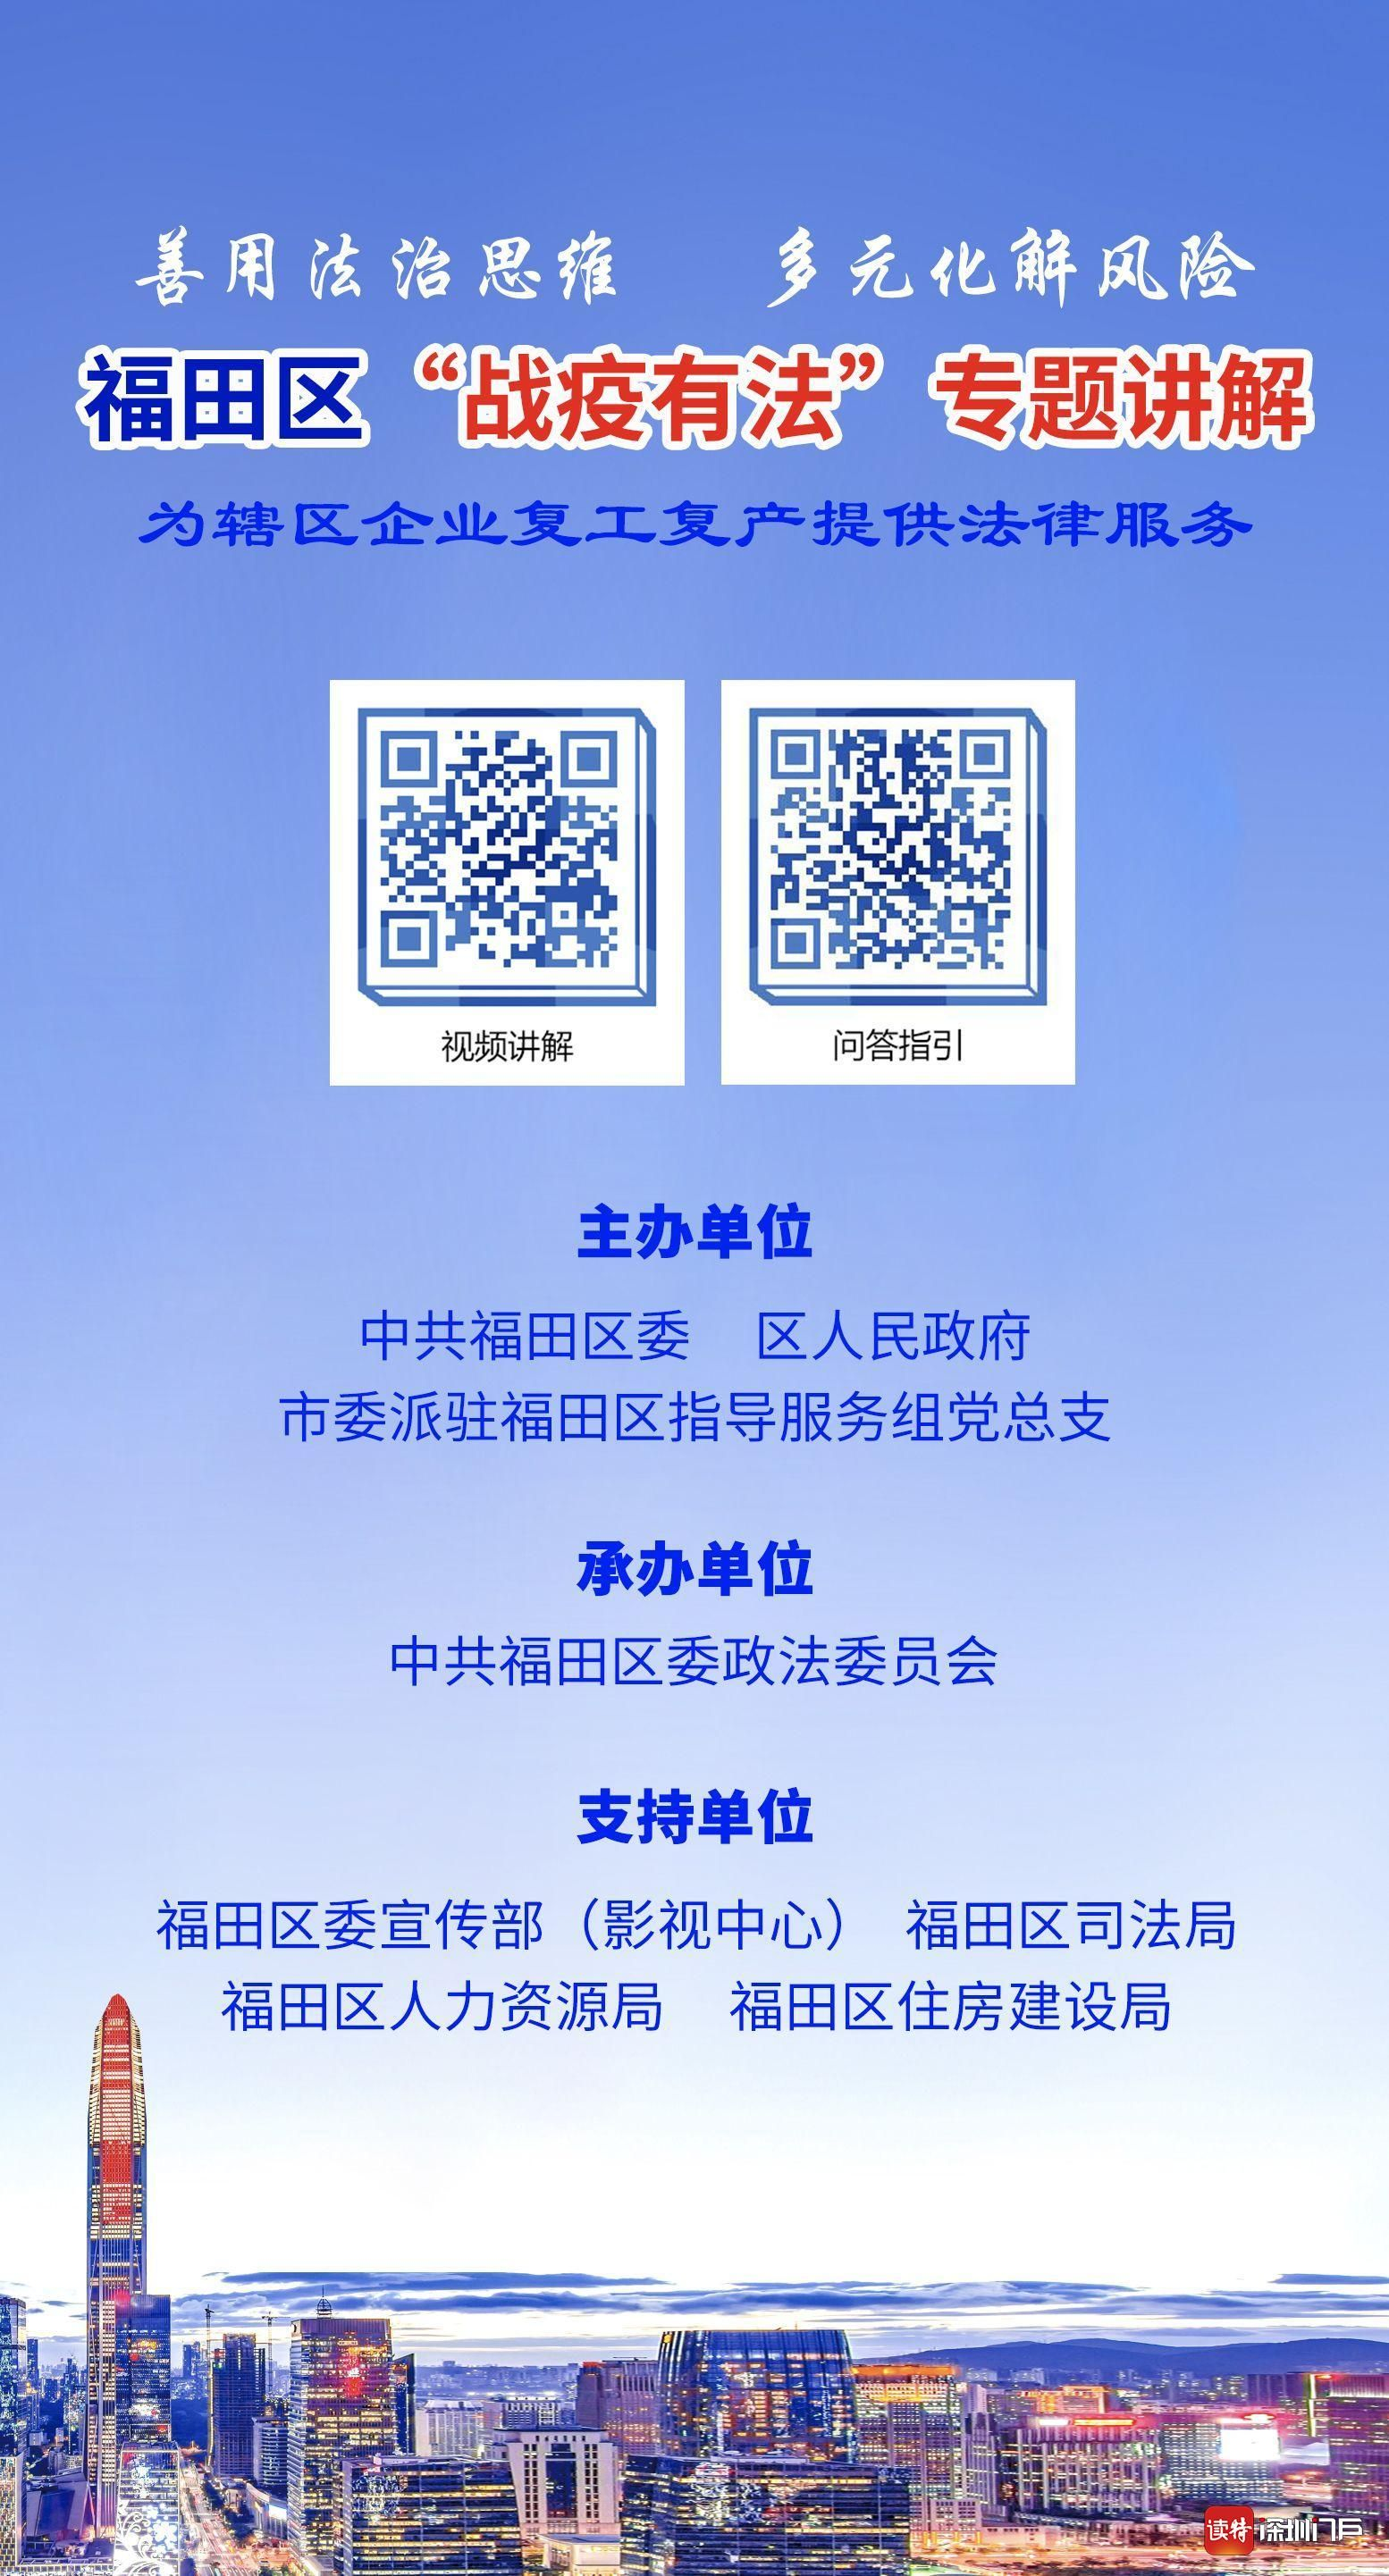 http://www.szminfu.com/kejizhishi/43735.html